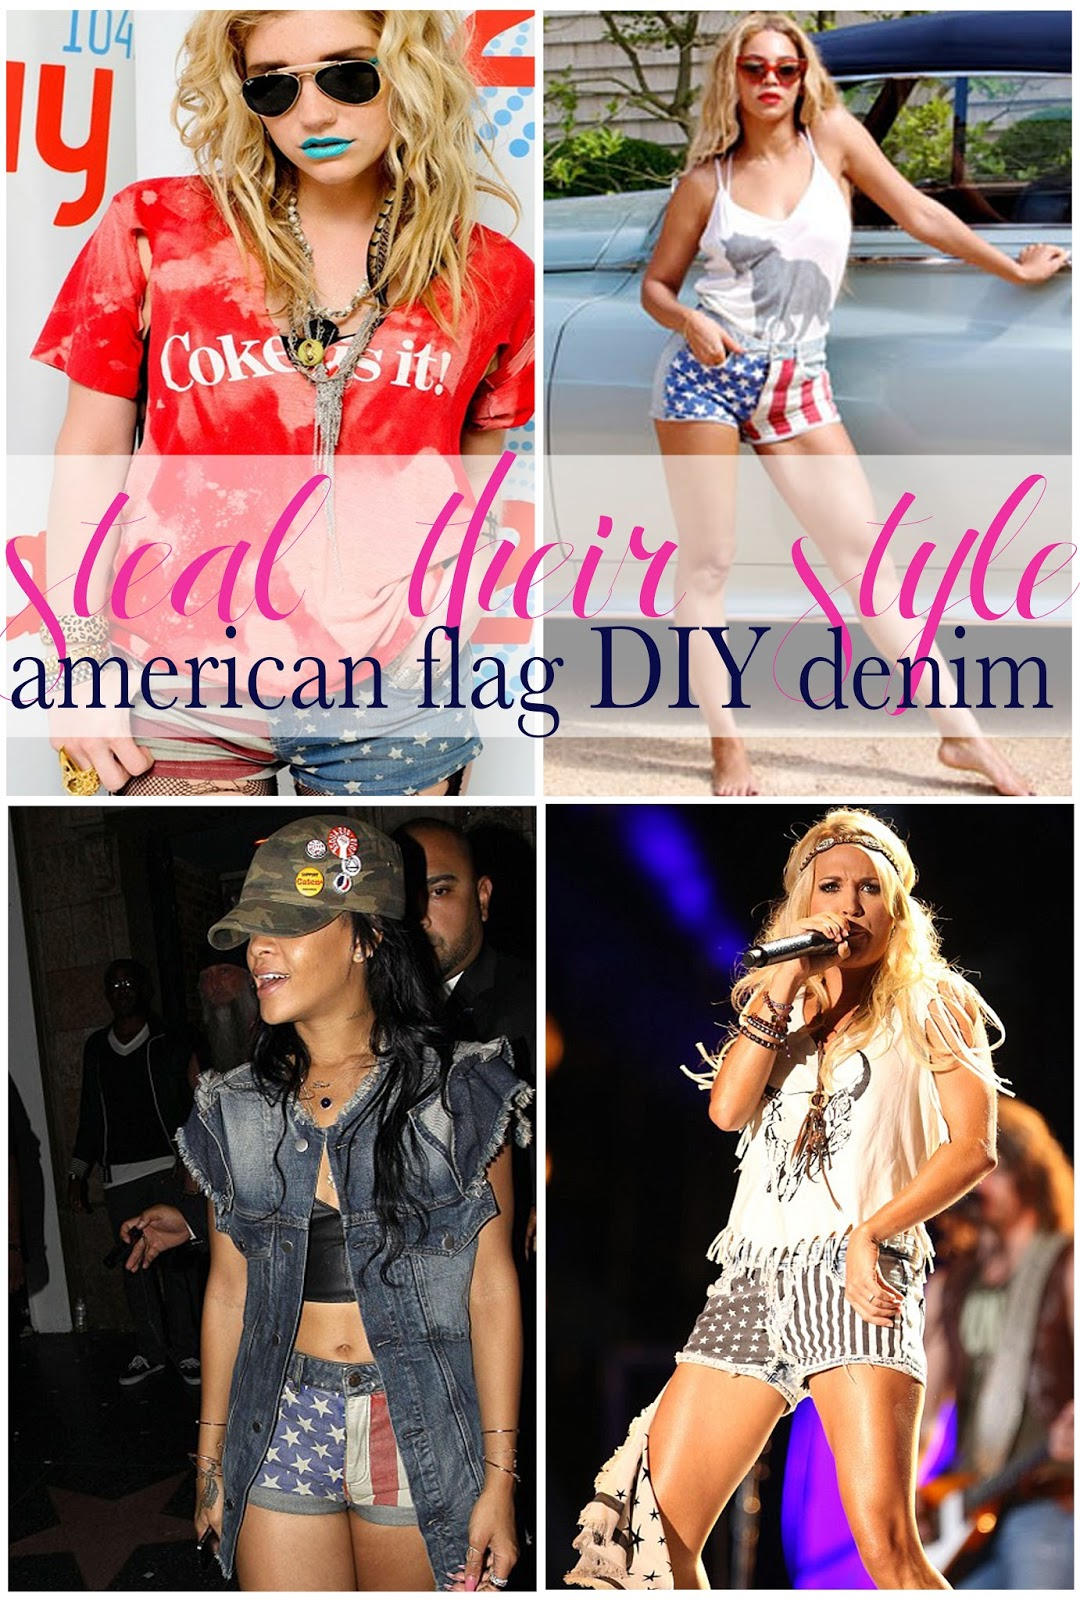 celebrities wearing american flag shorts, american flag shorts, DIY american flag shorts